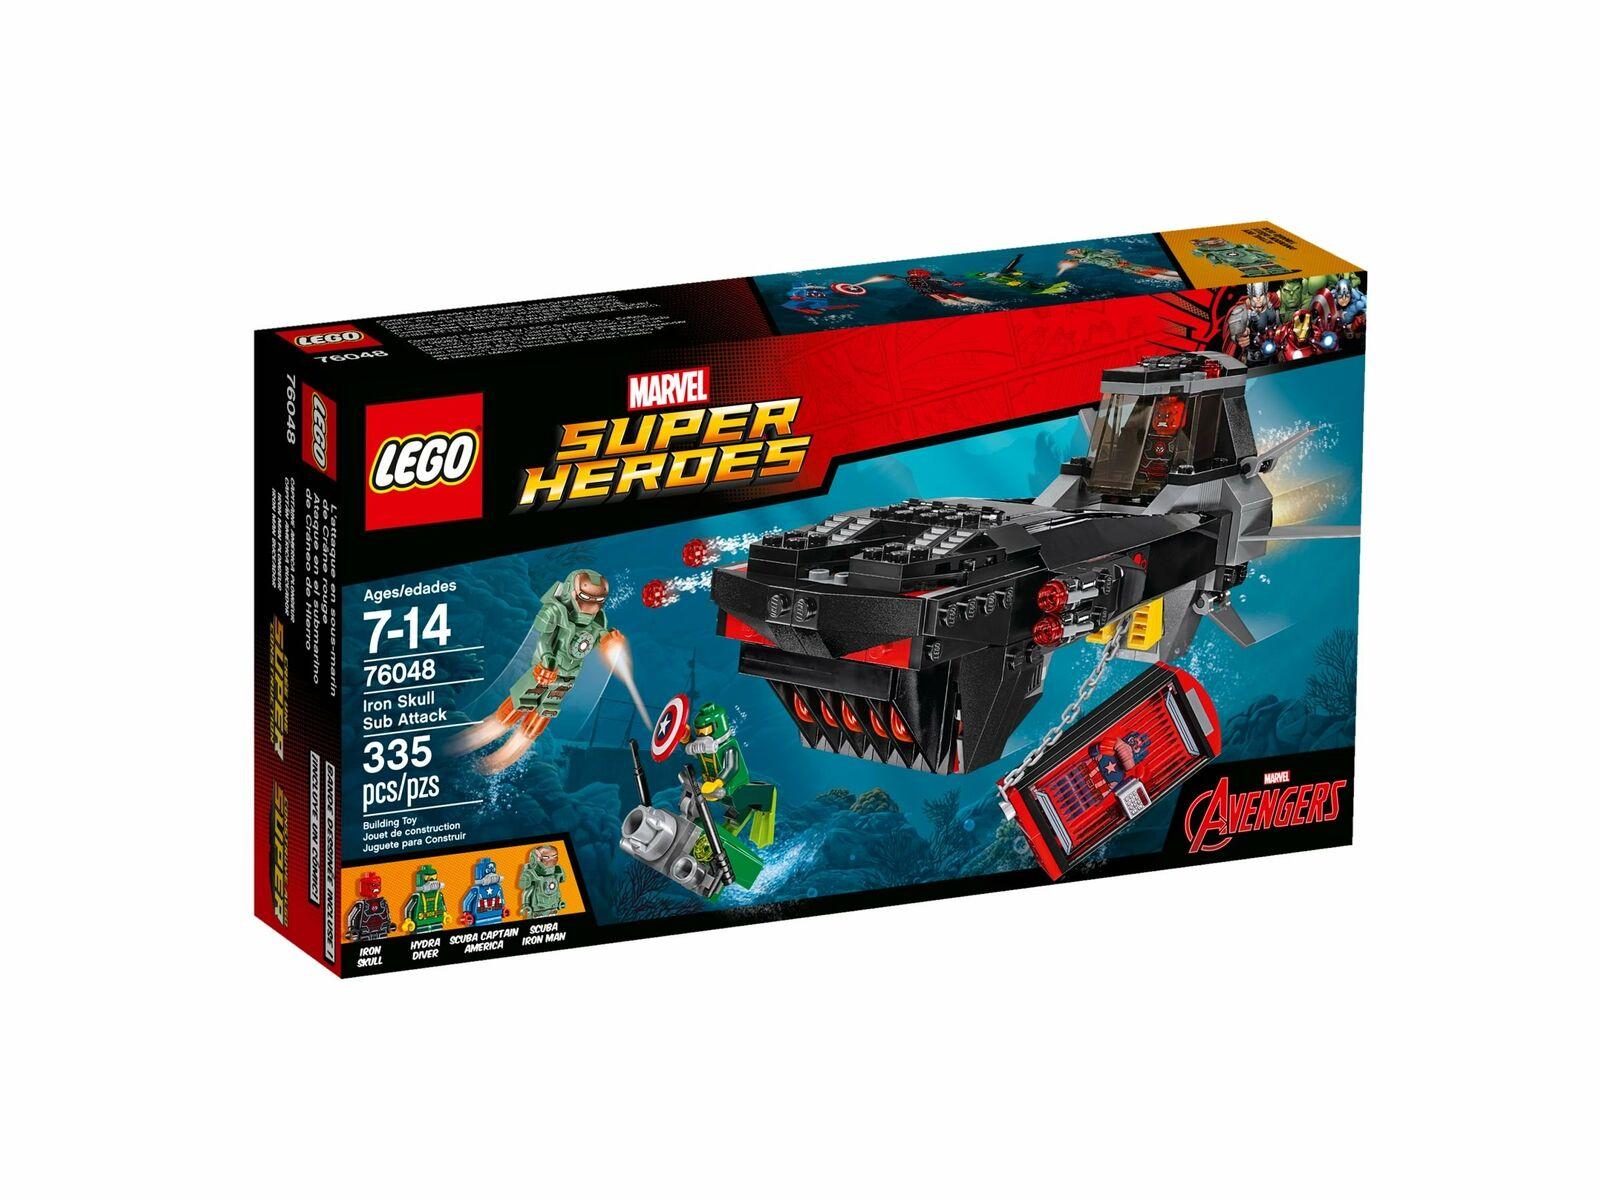 LEGO® 76048 Marvel Marvel Marvel Super Heroes Iron Skull Sub Attack e4bfb3